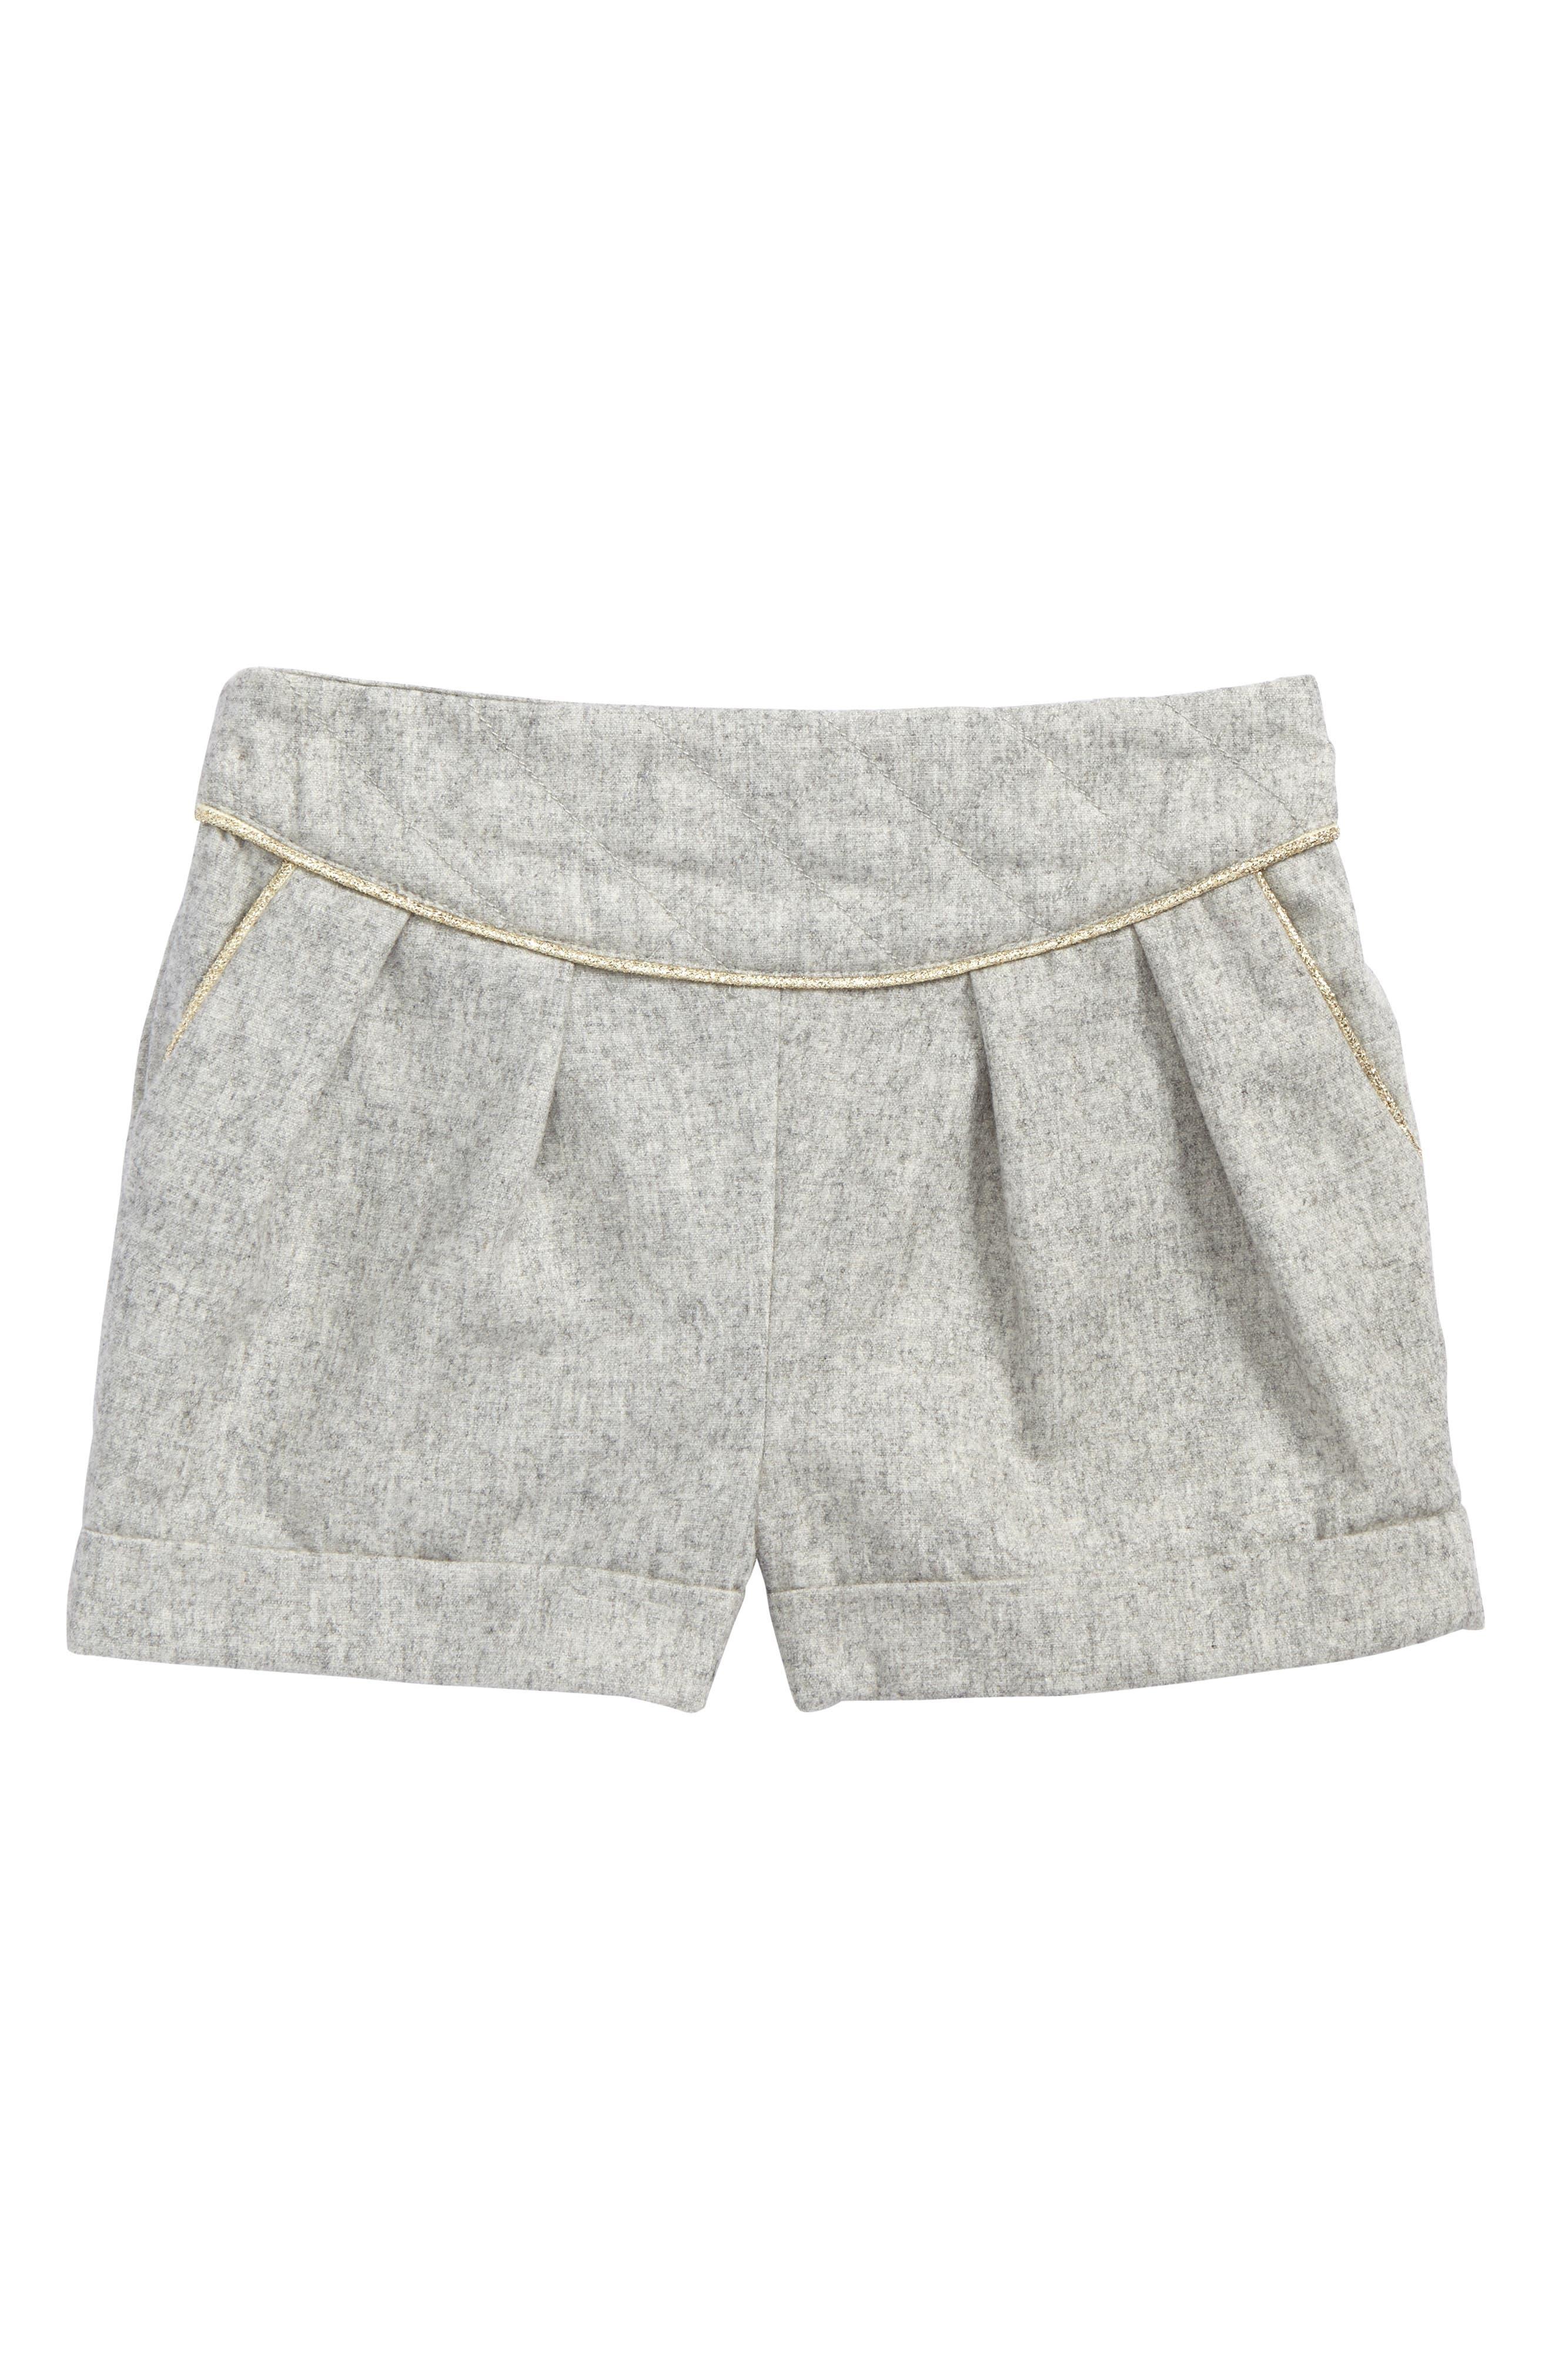 Diamond Shorts,                         Main,                         color, Pale Grey